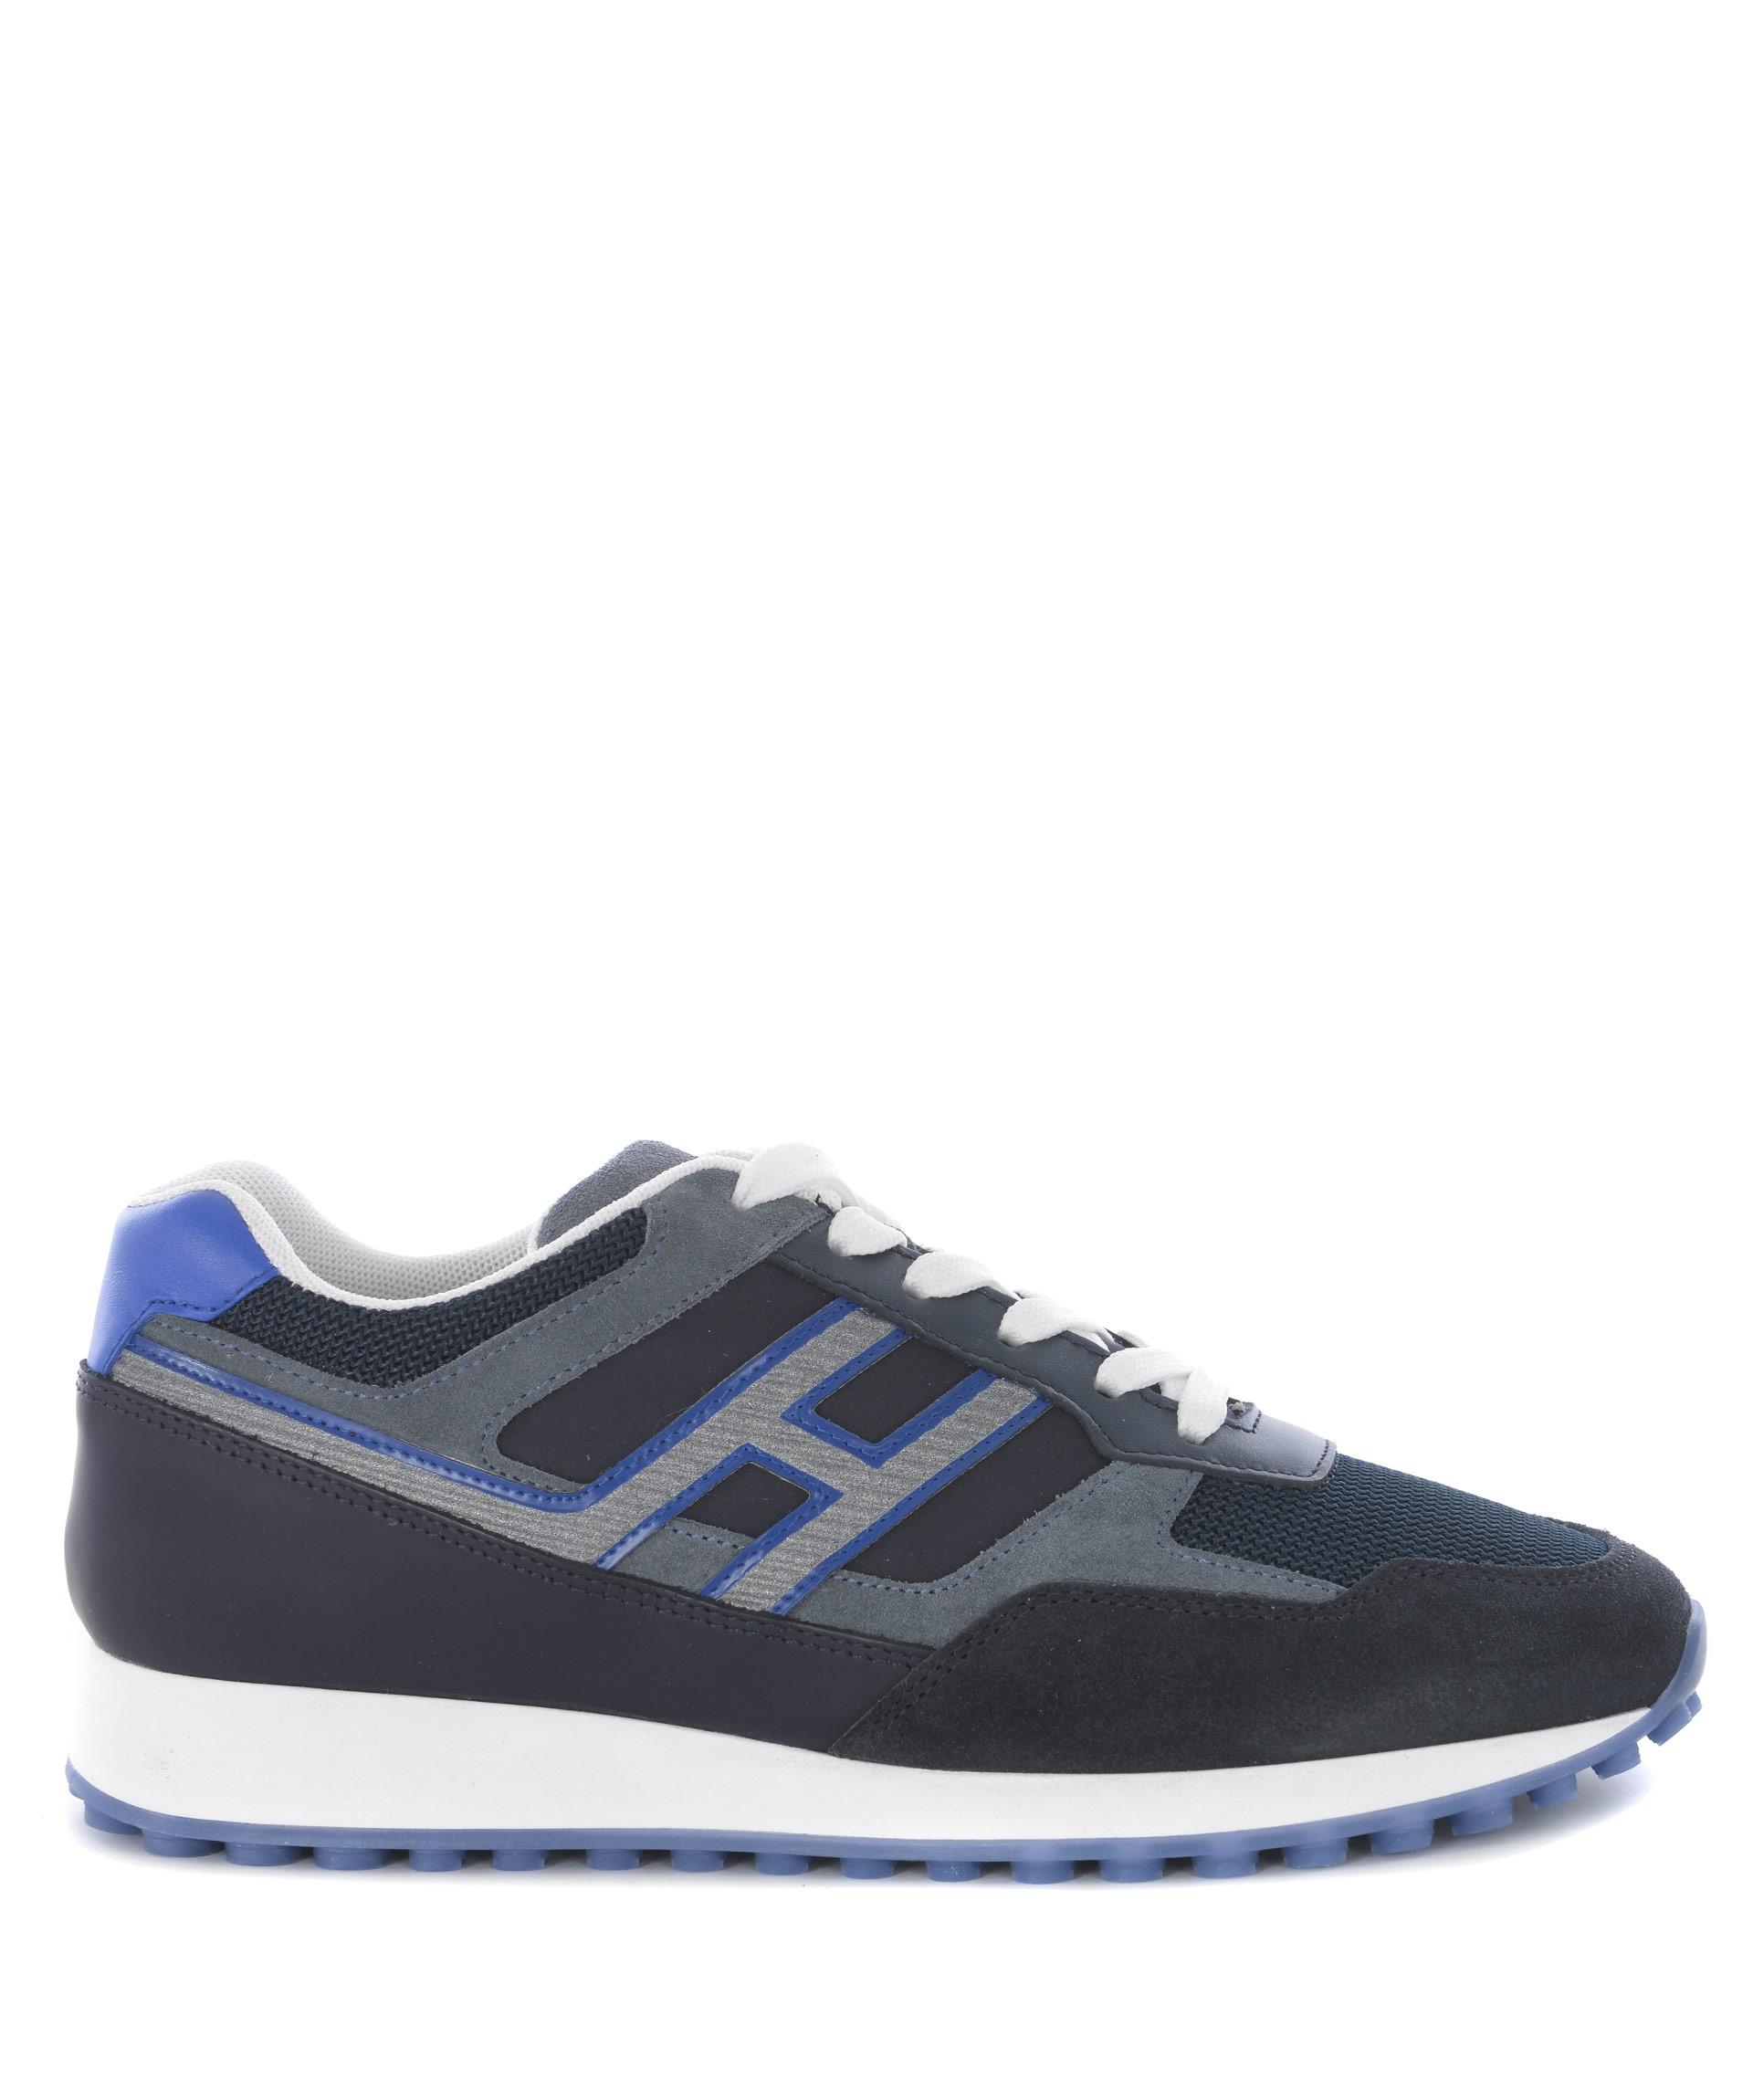 huge discount 4d3f1 5db5c Sneakers uomo Hogan